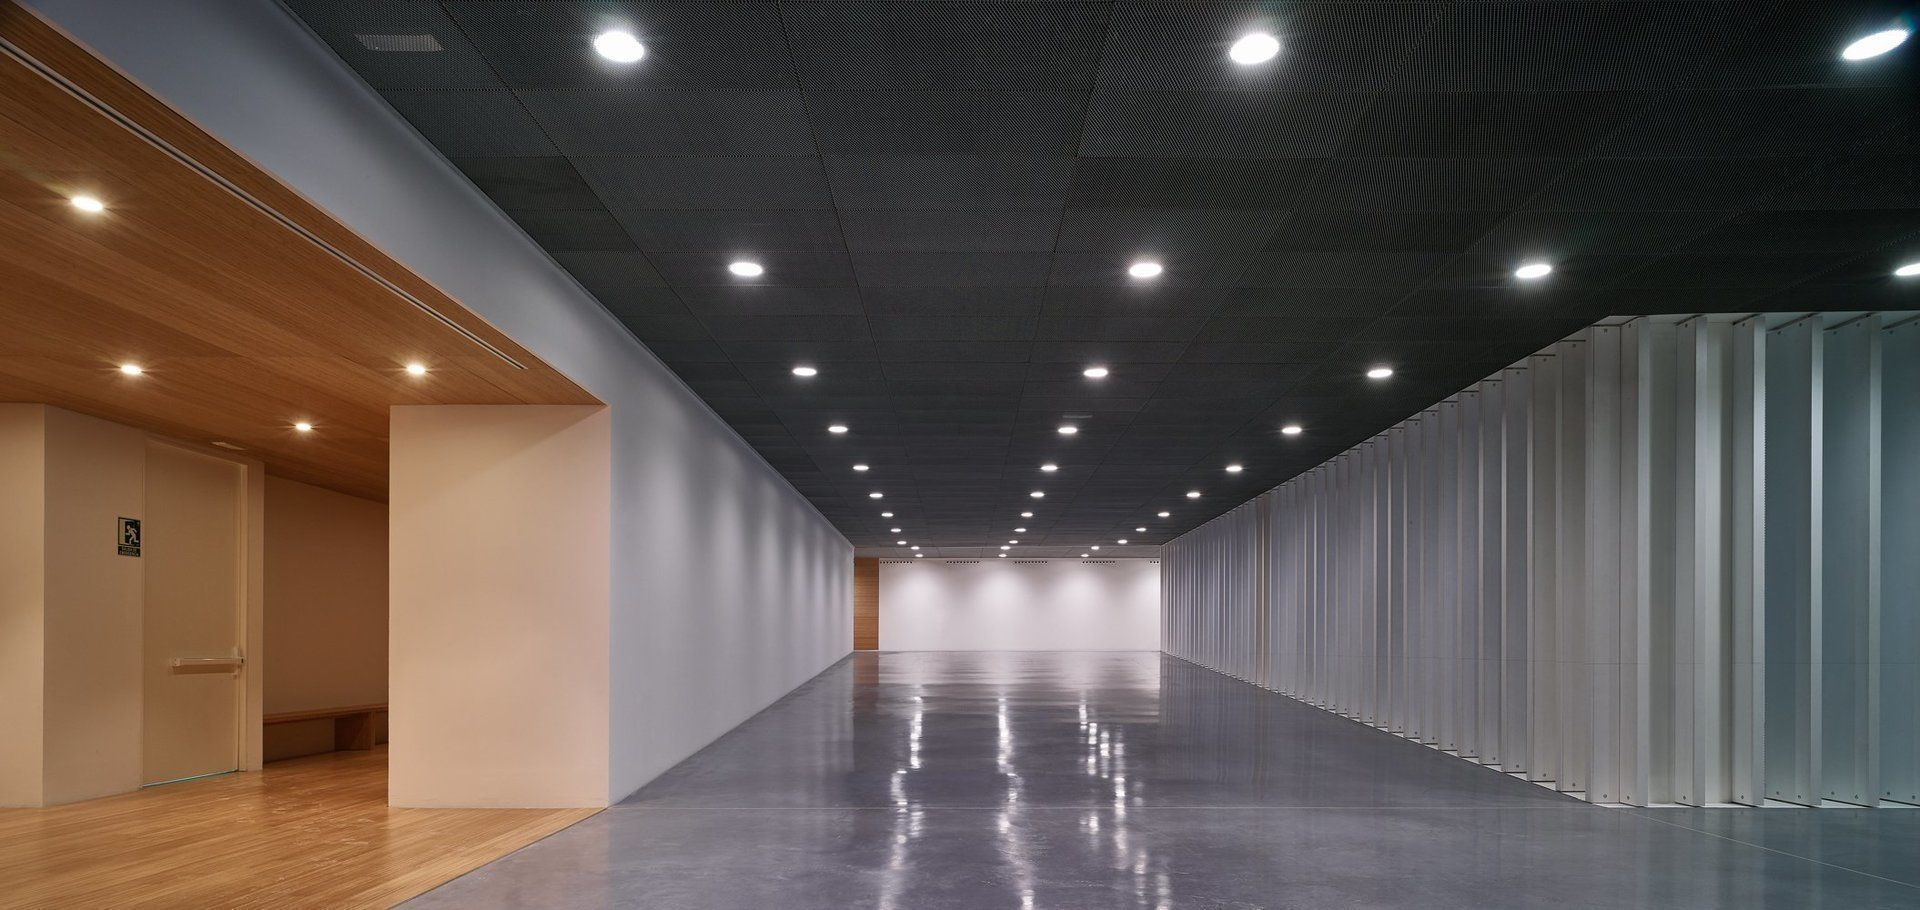 Centro pompidou de m laga arqa - Diseno de interiores malaga ...